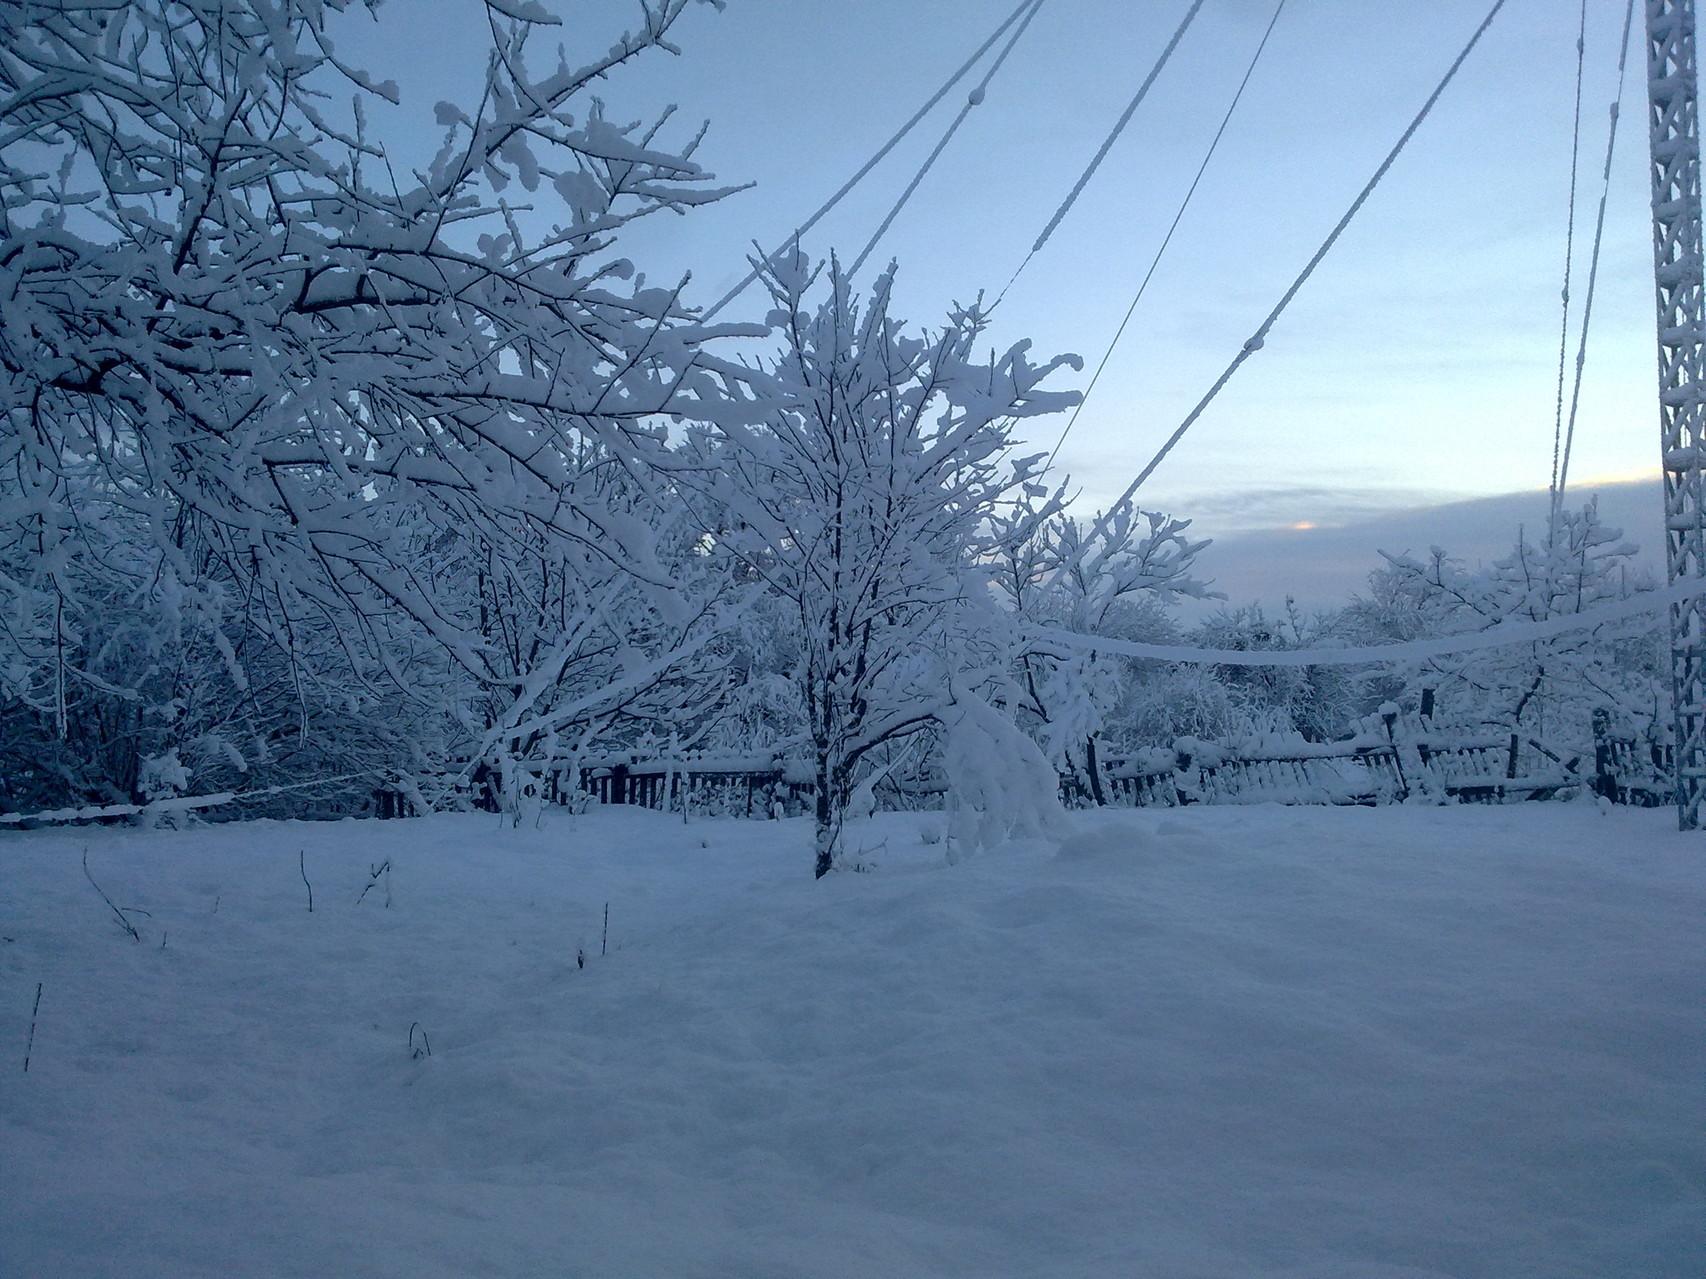 Winter sights